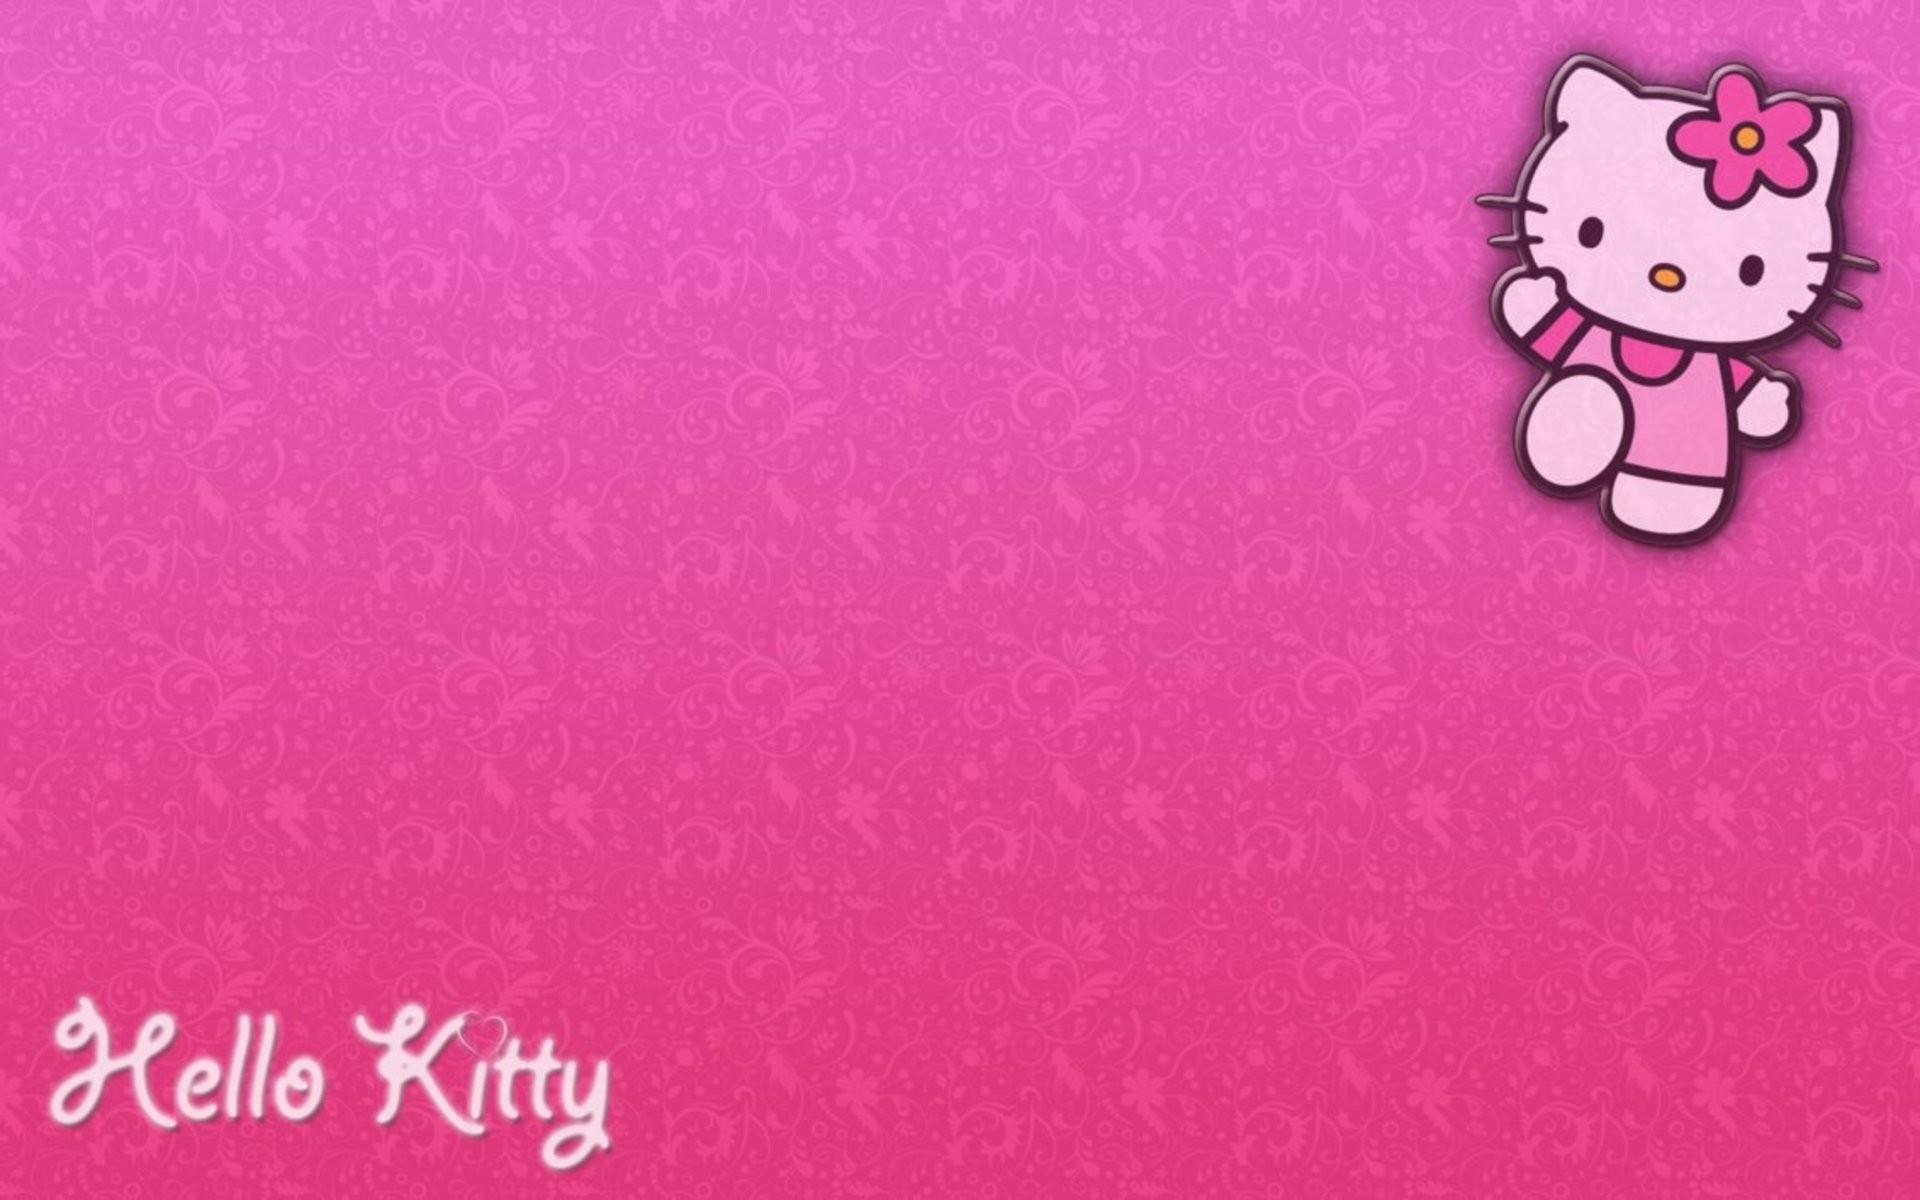 1920x1080 Wallpapers For Hello Kitty Wallpaper Desktop Black